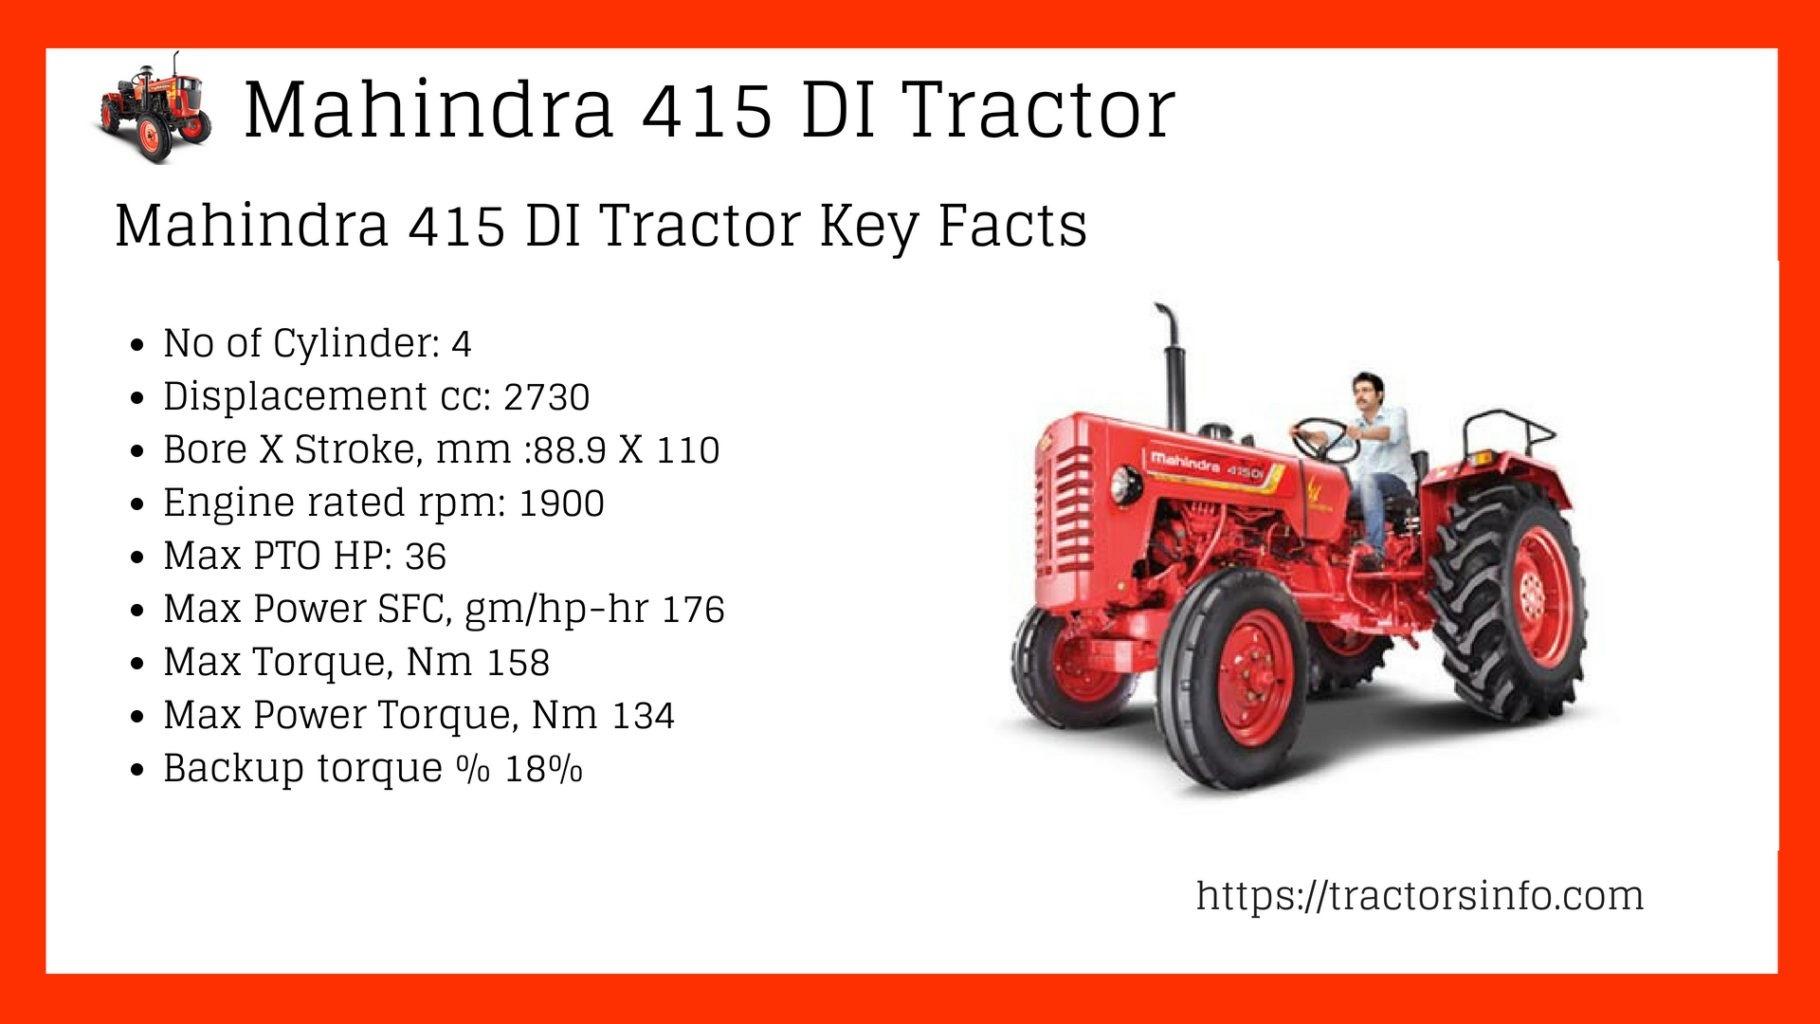 Mahindra-415-DI-Tractor